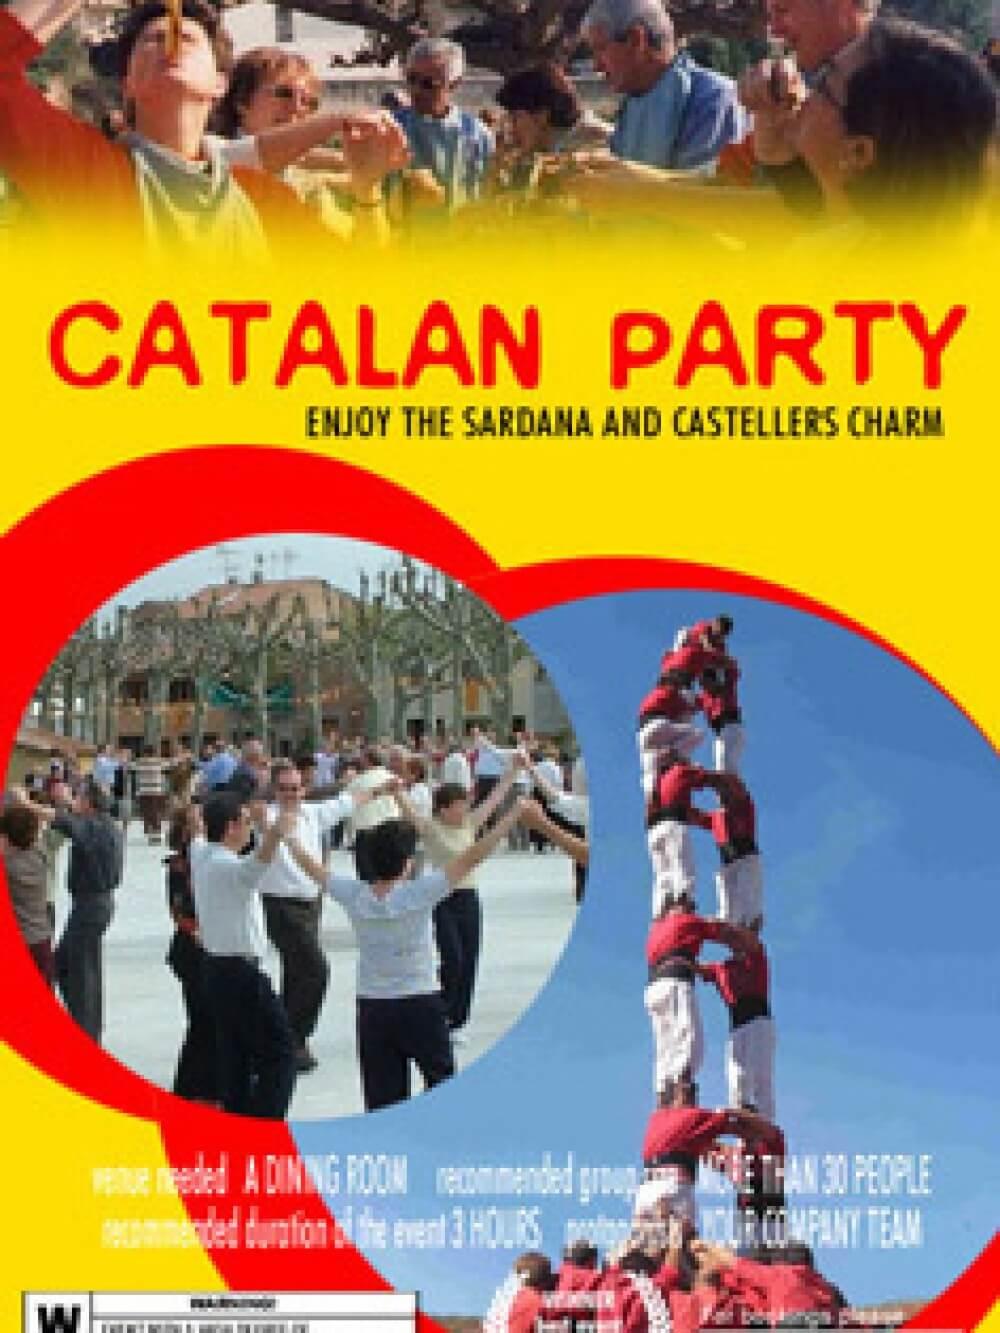 catalan_party_vertical_web